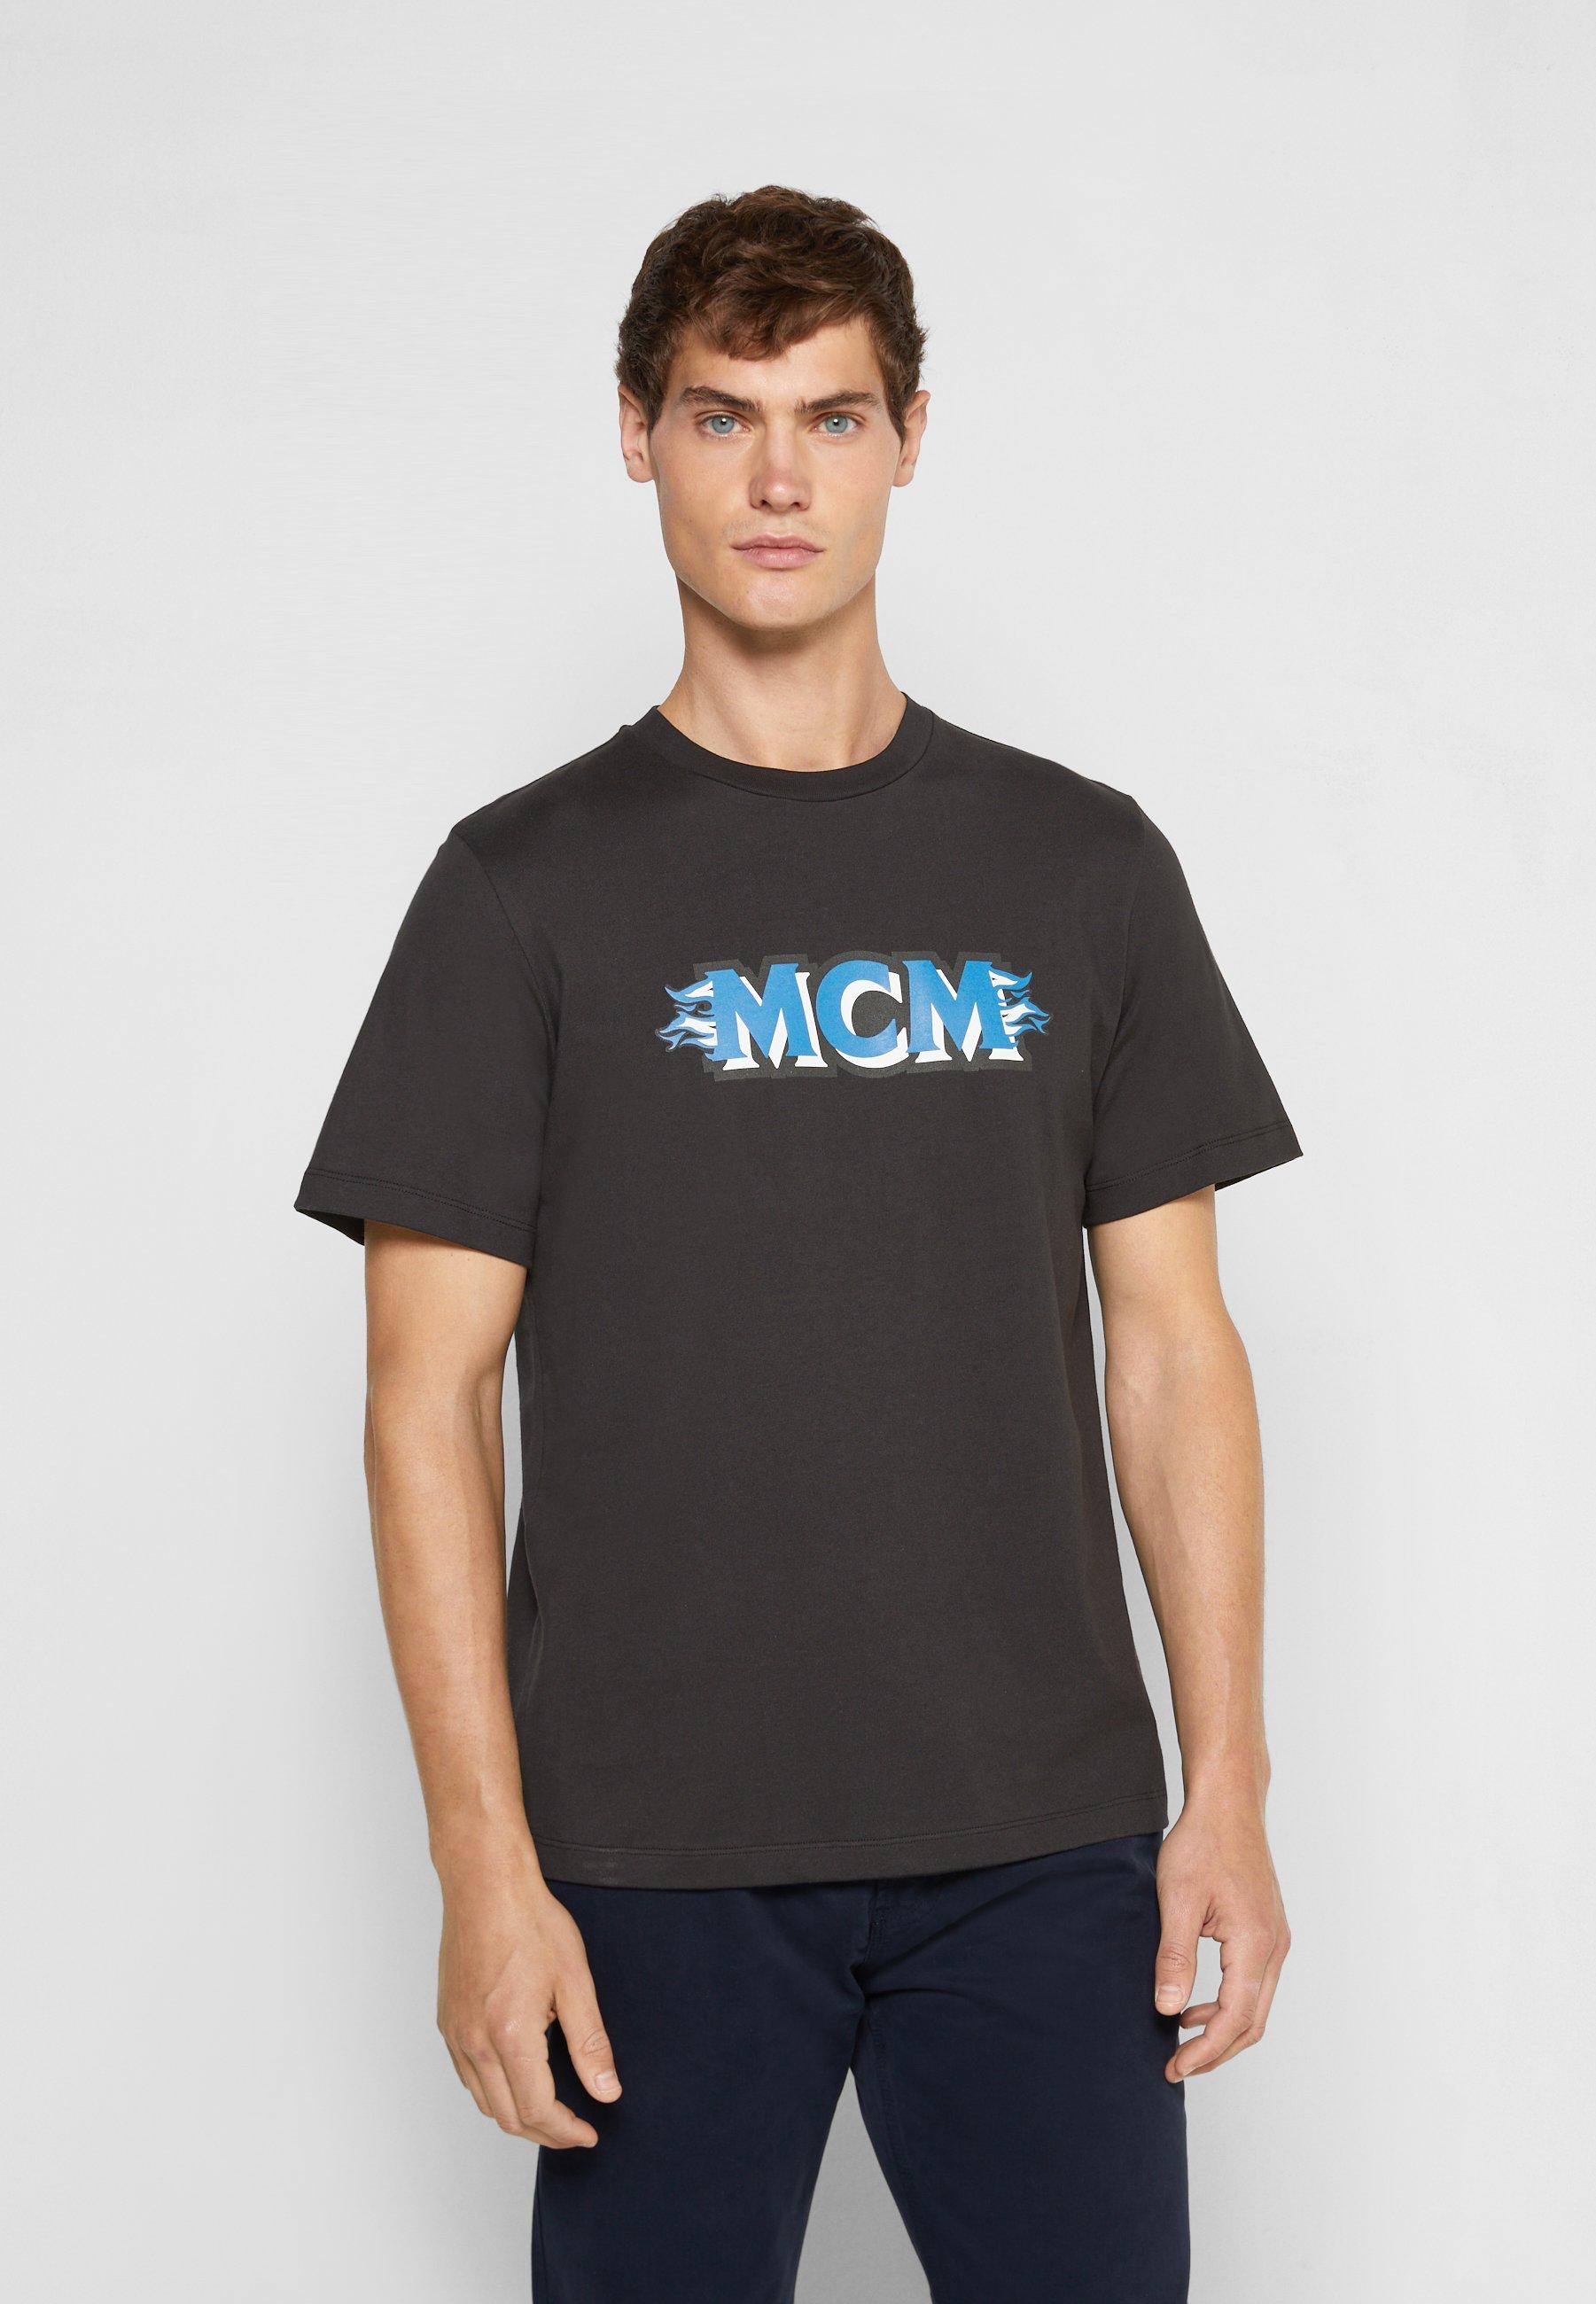 Homme LOGO GROUP SHORT SLEEVES - T-shirt imprimé